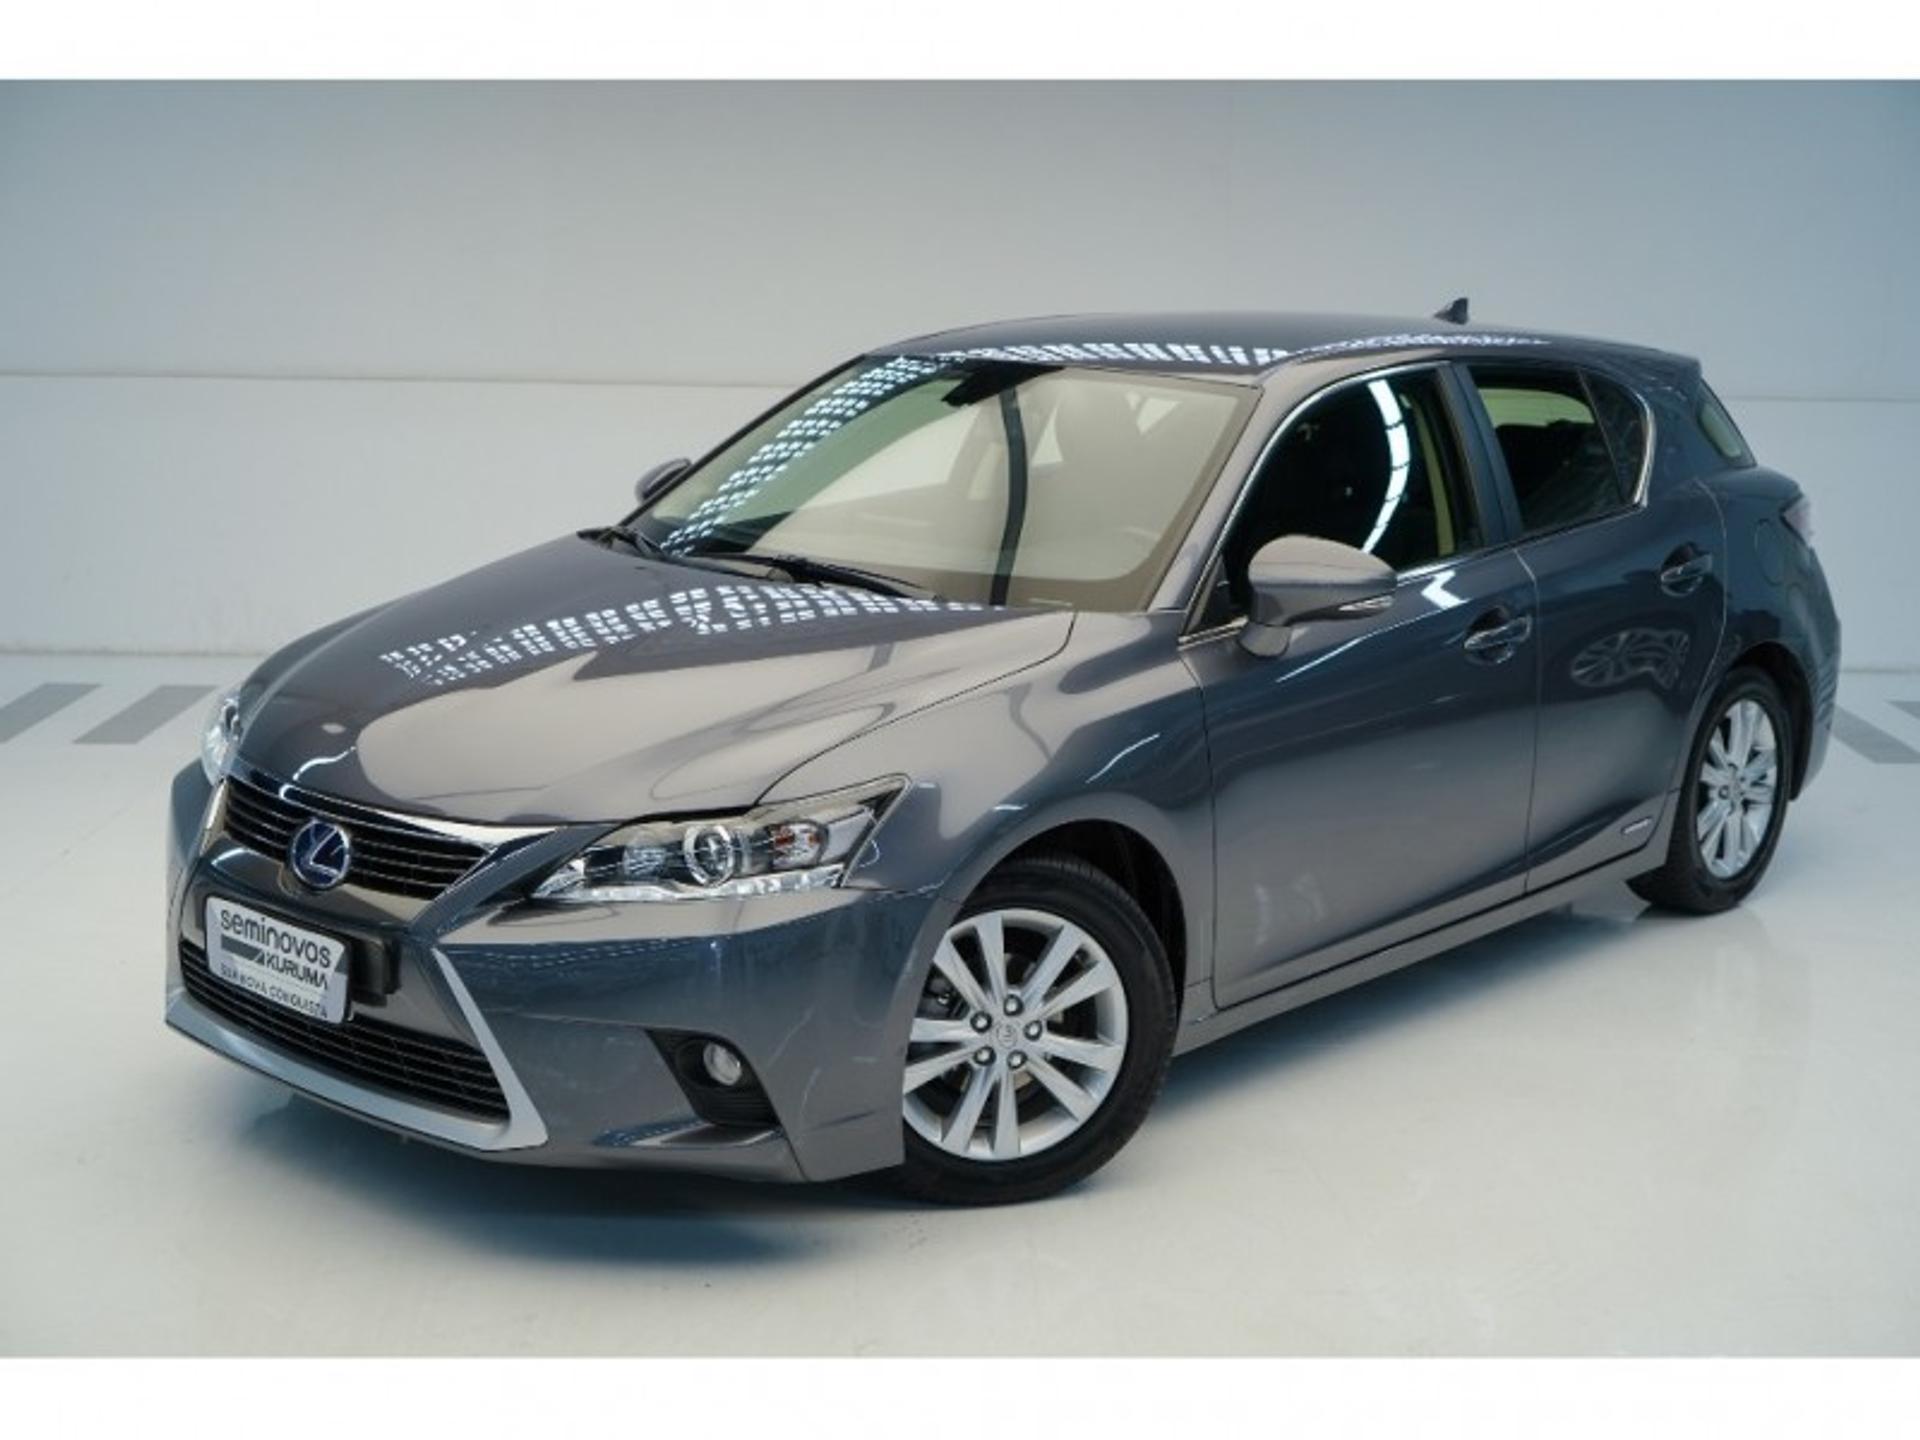 Lexus Ct200h 1.8 16v Hibrido 4p Automatico Wmimagem09565695563